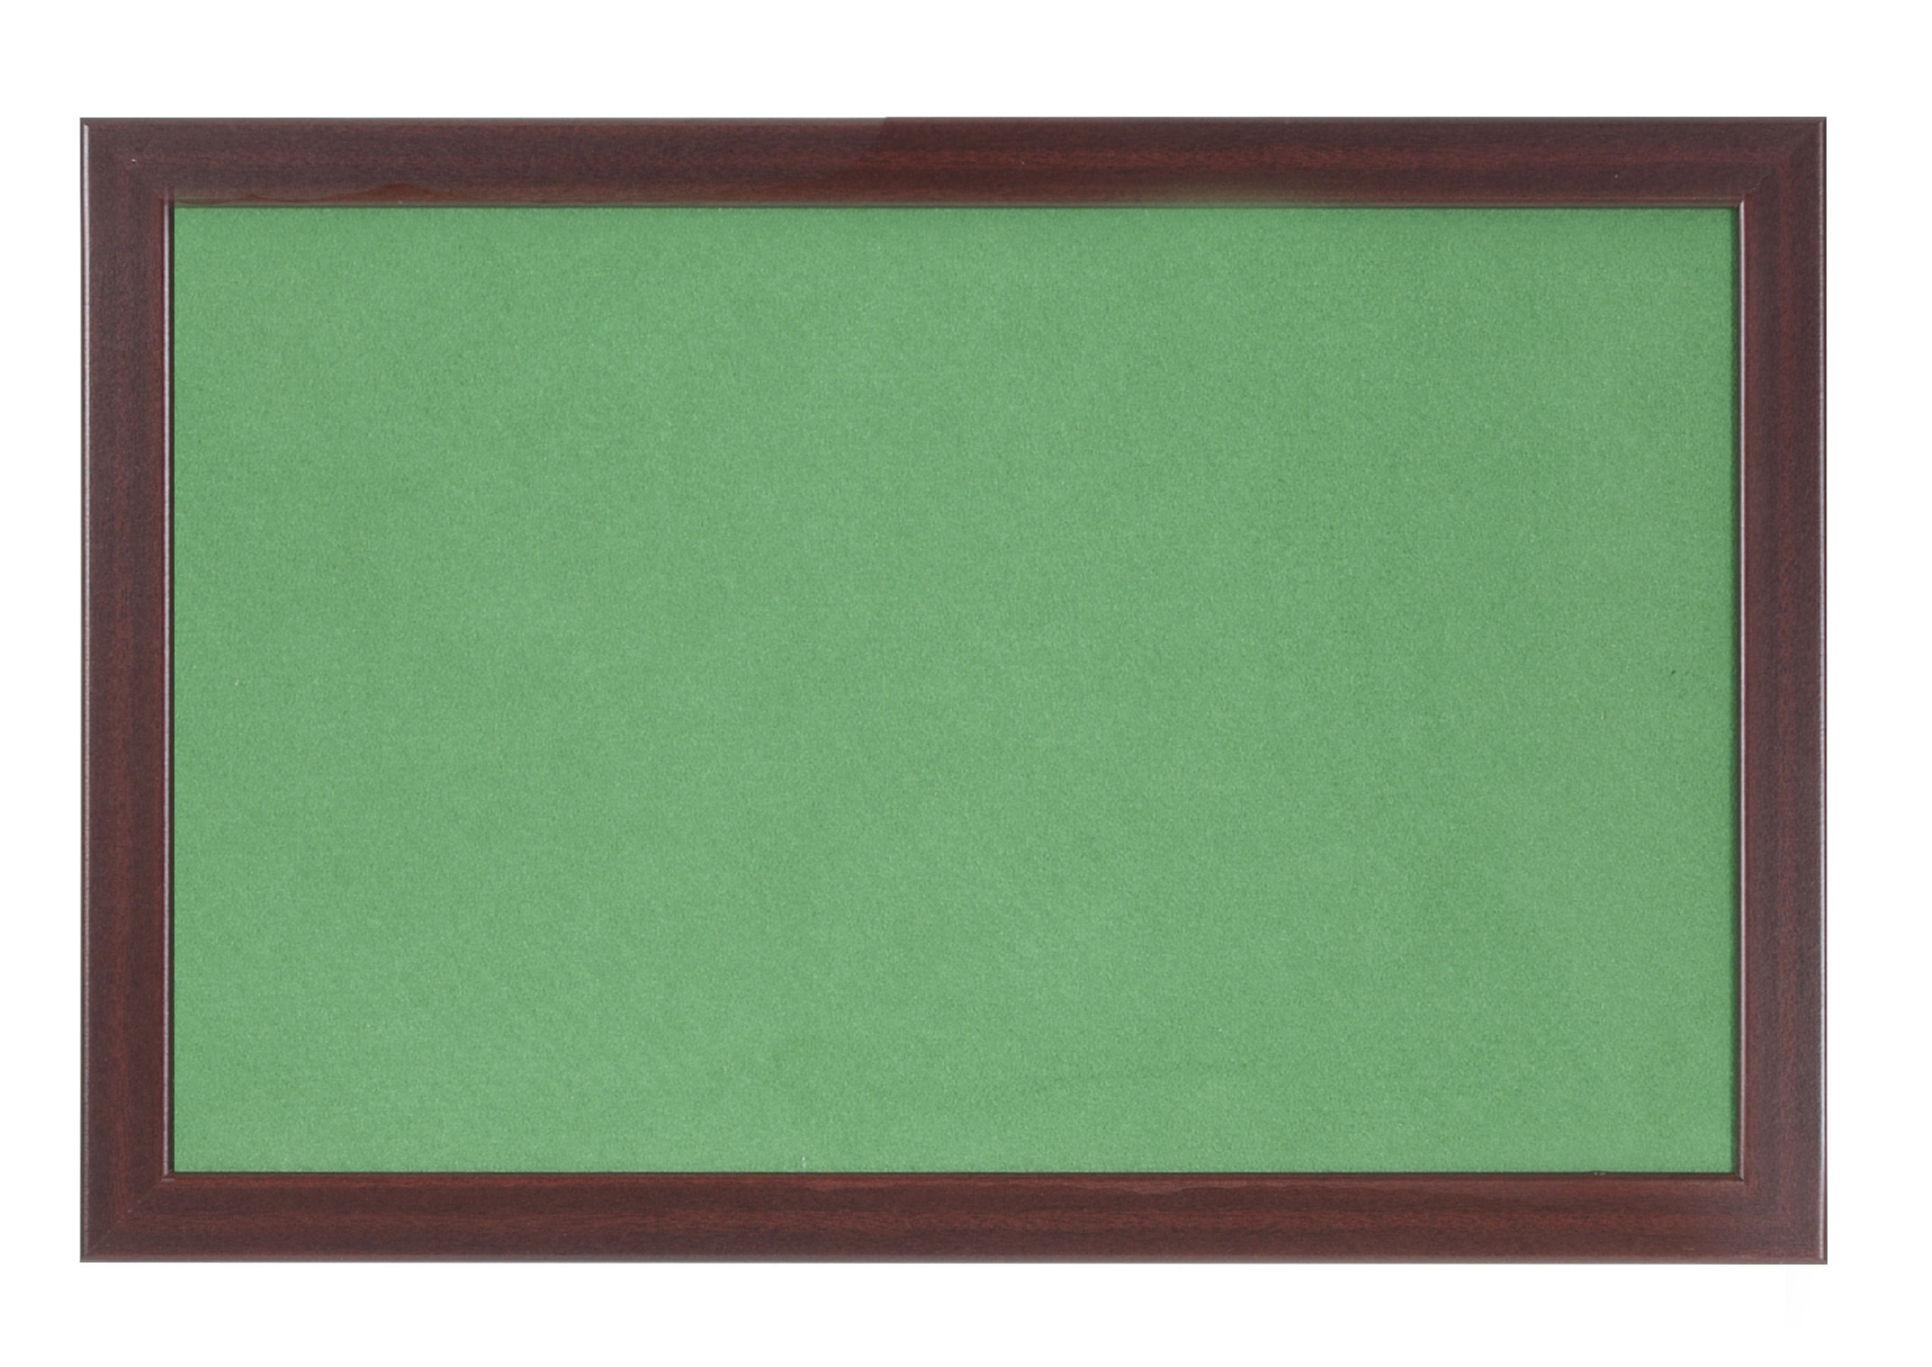 Felt Bi-Office Earth-It Green Felt Noticeboard Cherry Wood Frame 600x900mm